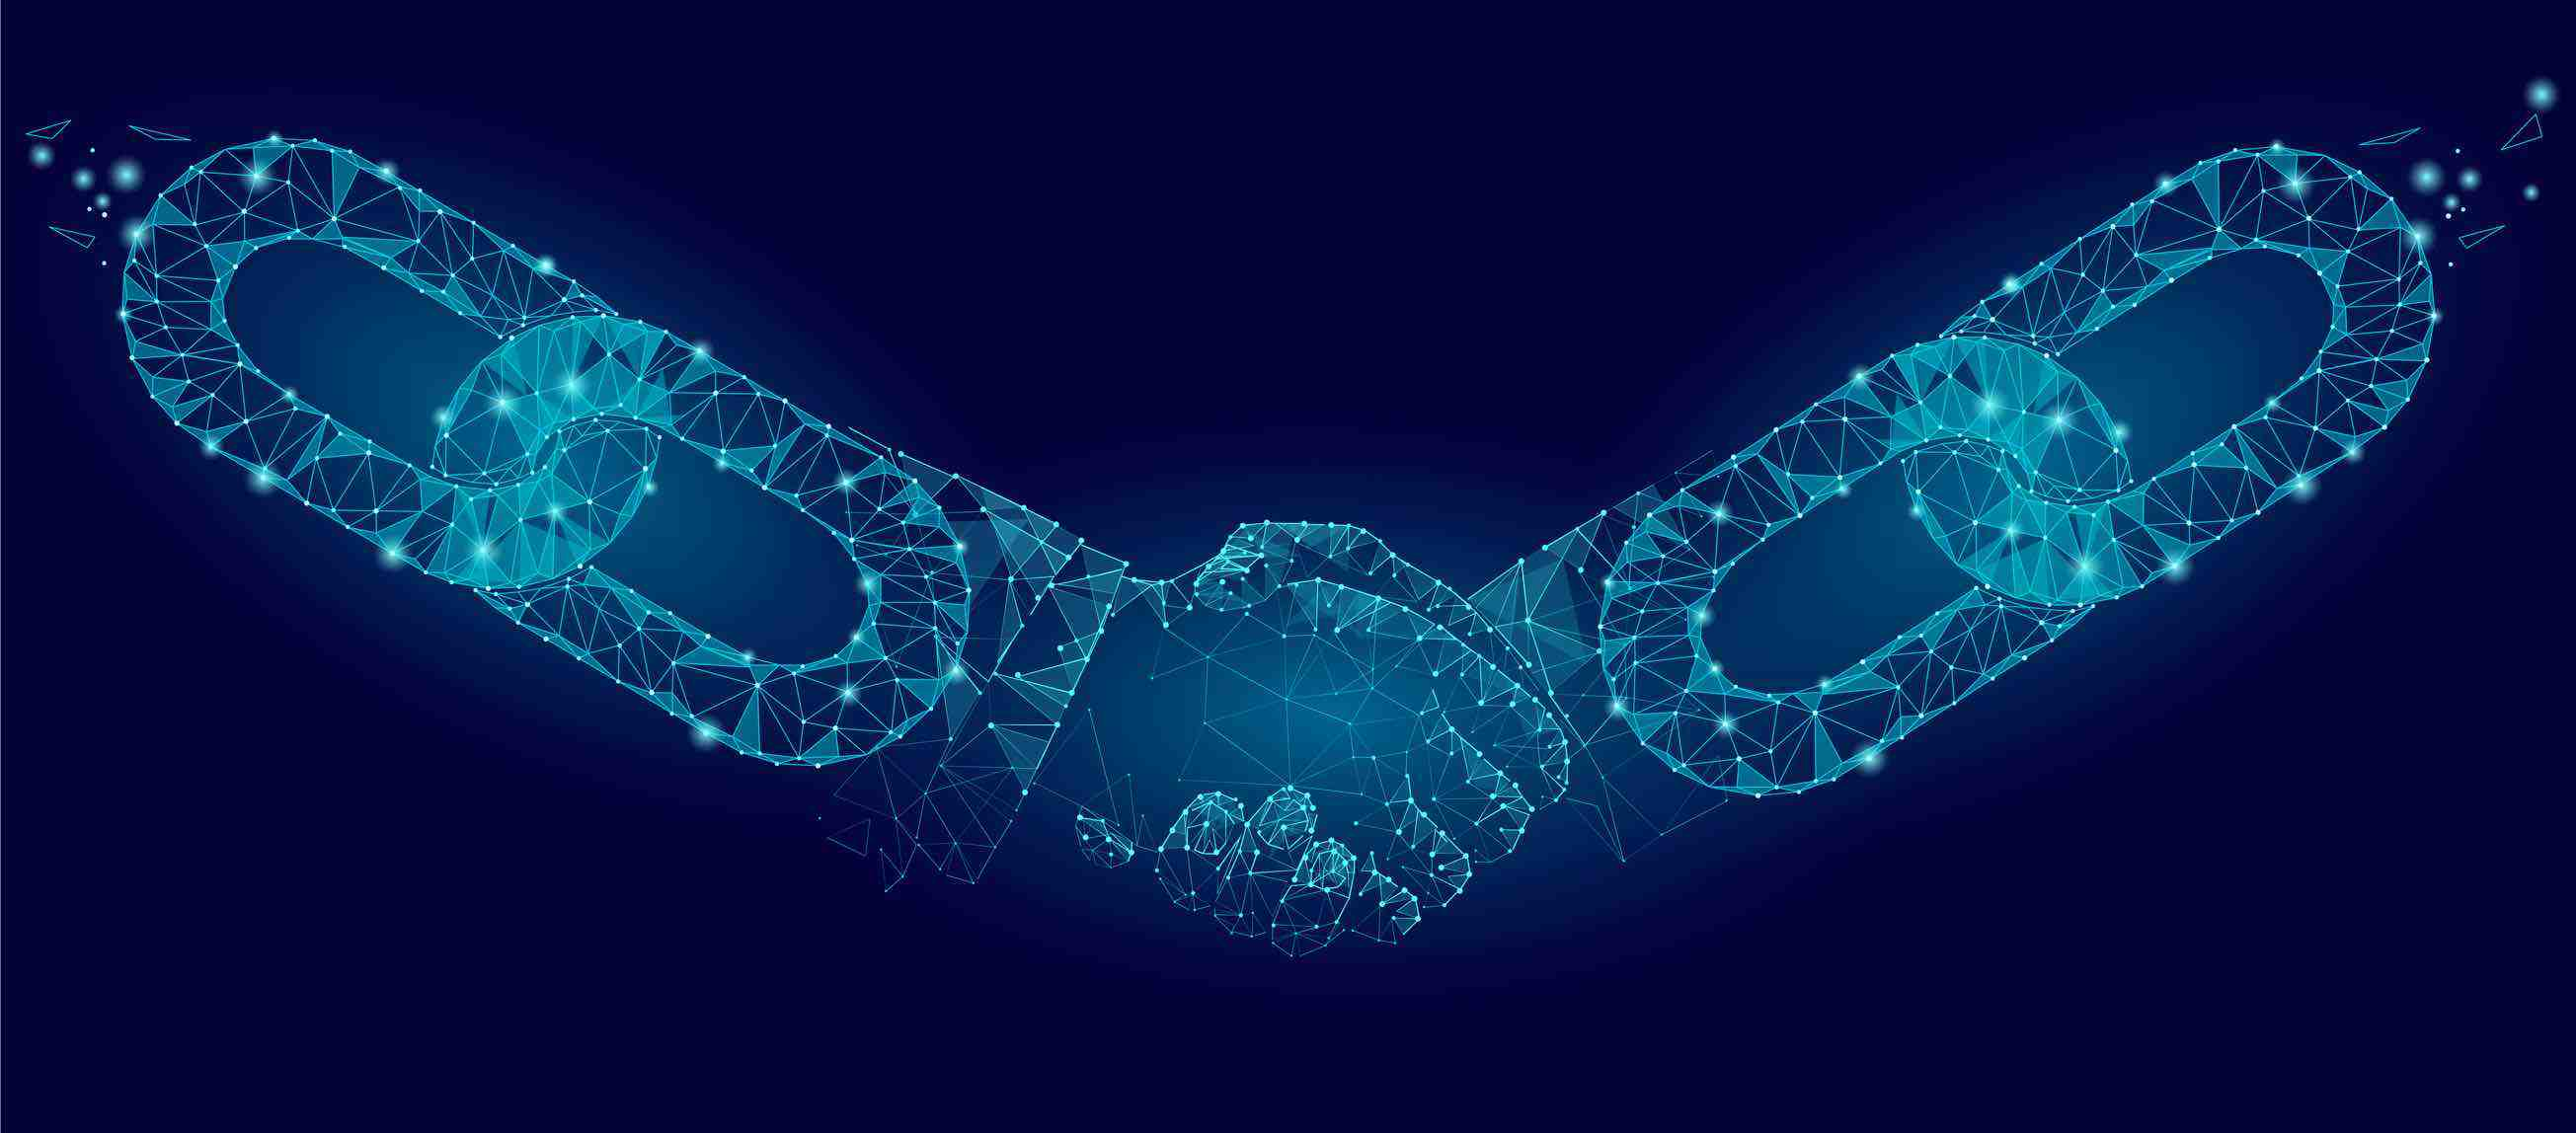 vechain Ethereum multi blockchain